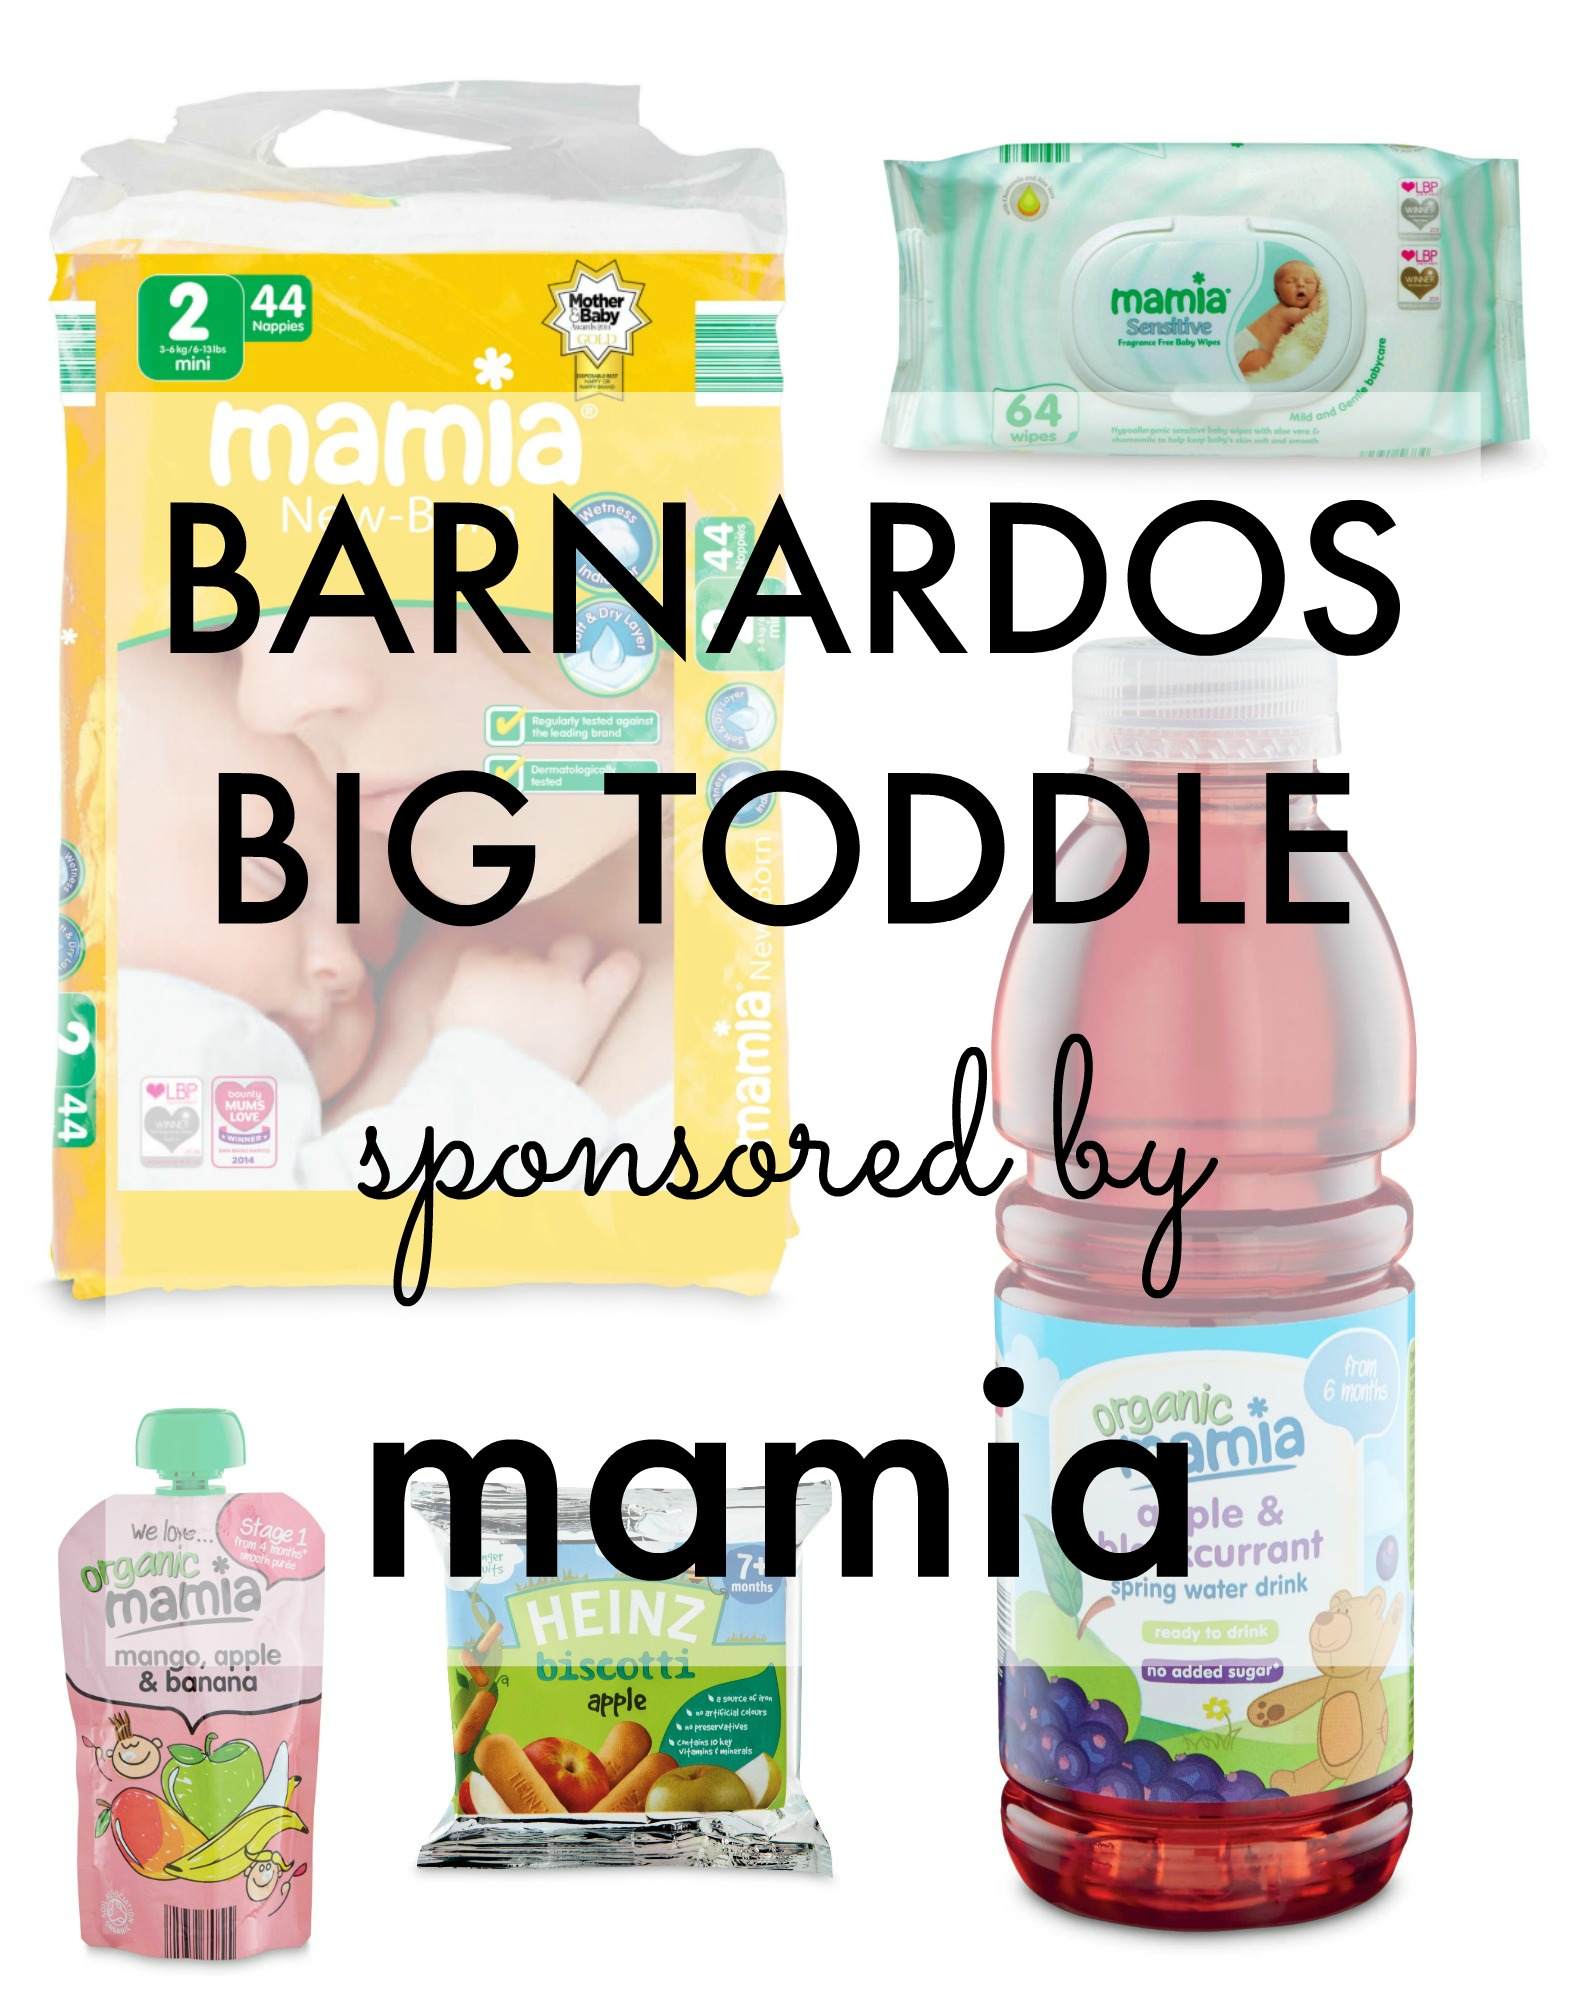 barnardos big toddle pin